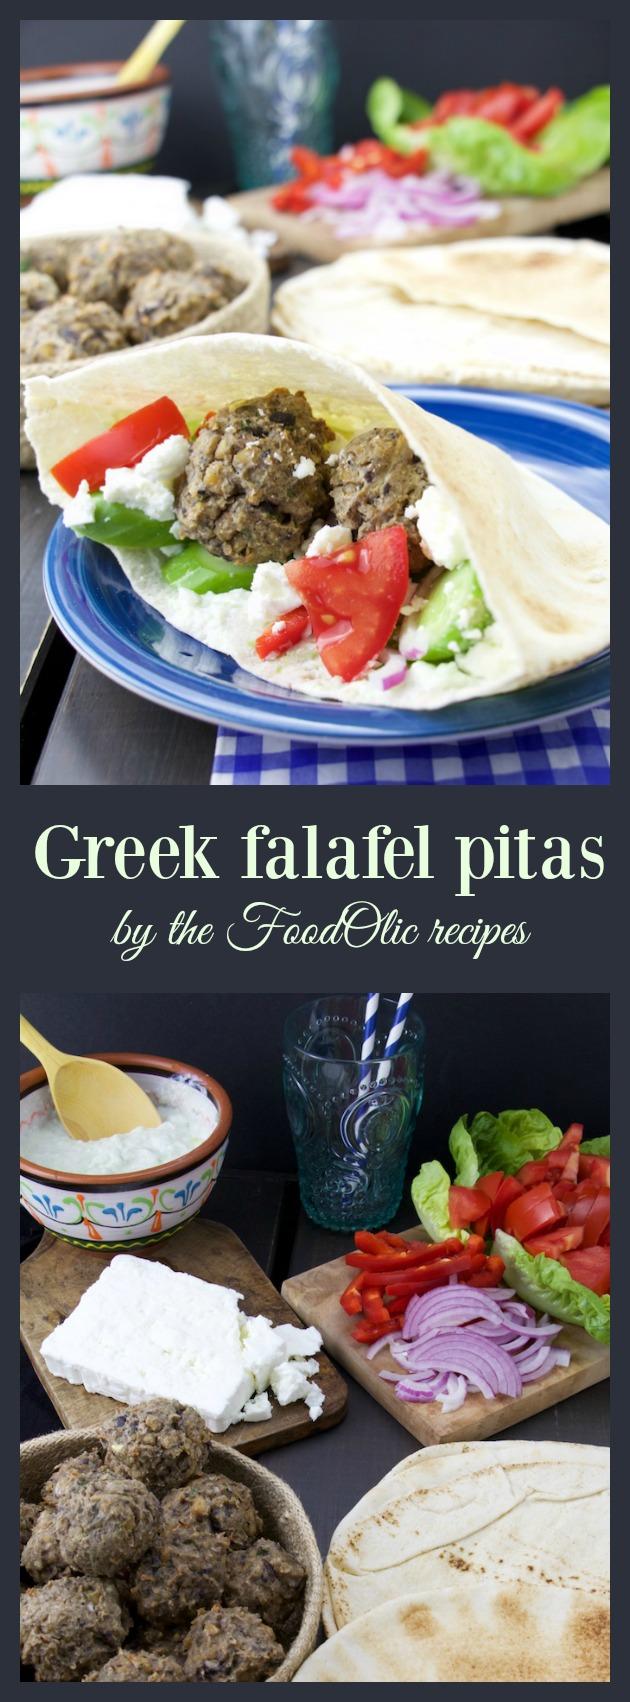 greekpitapin